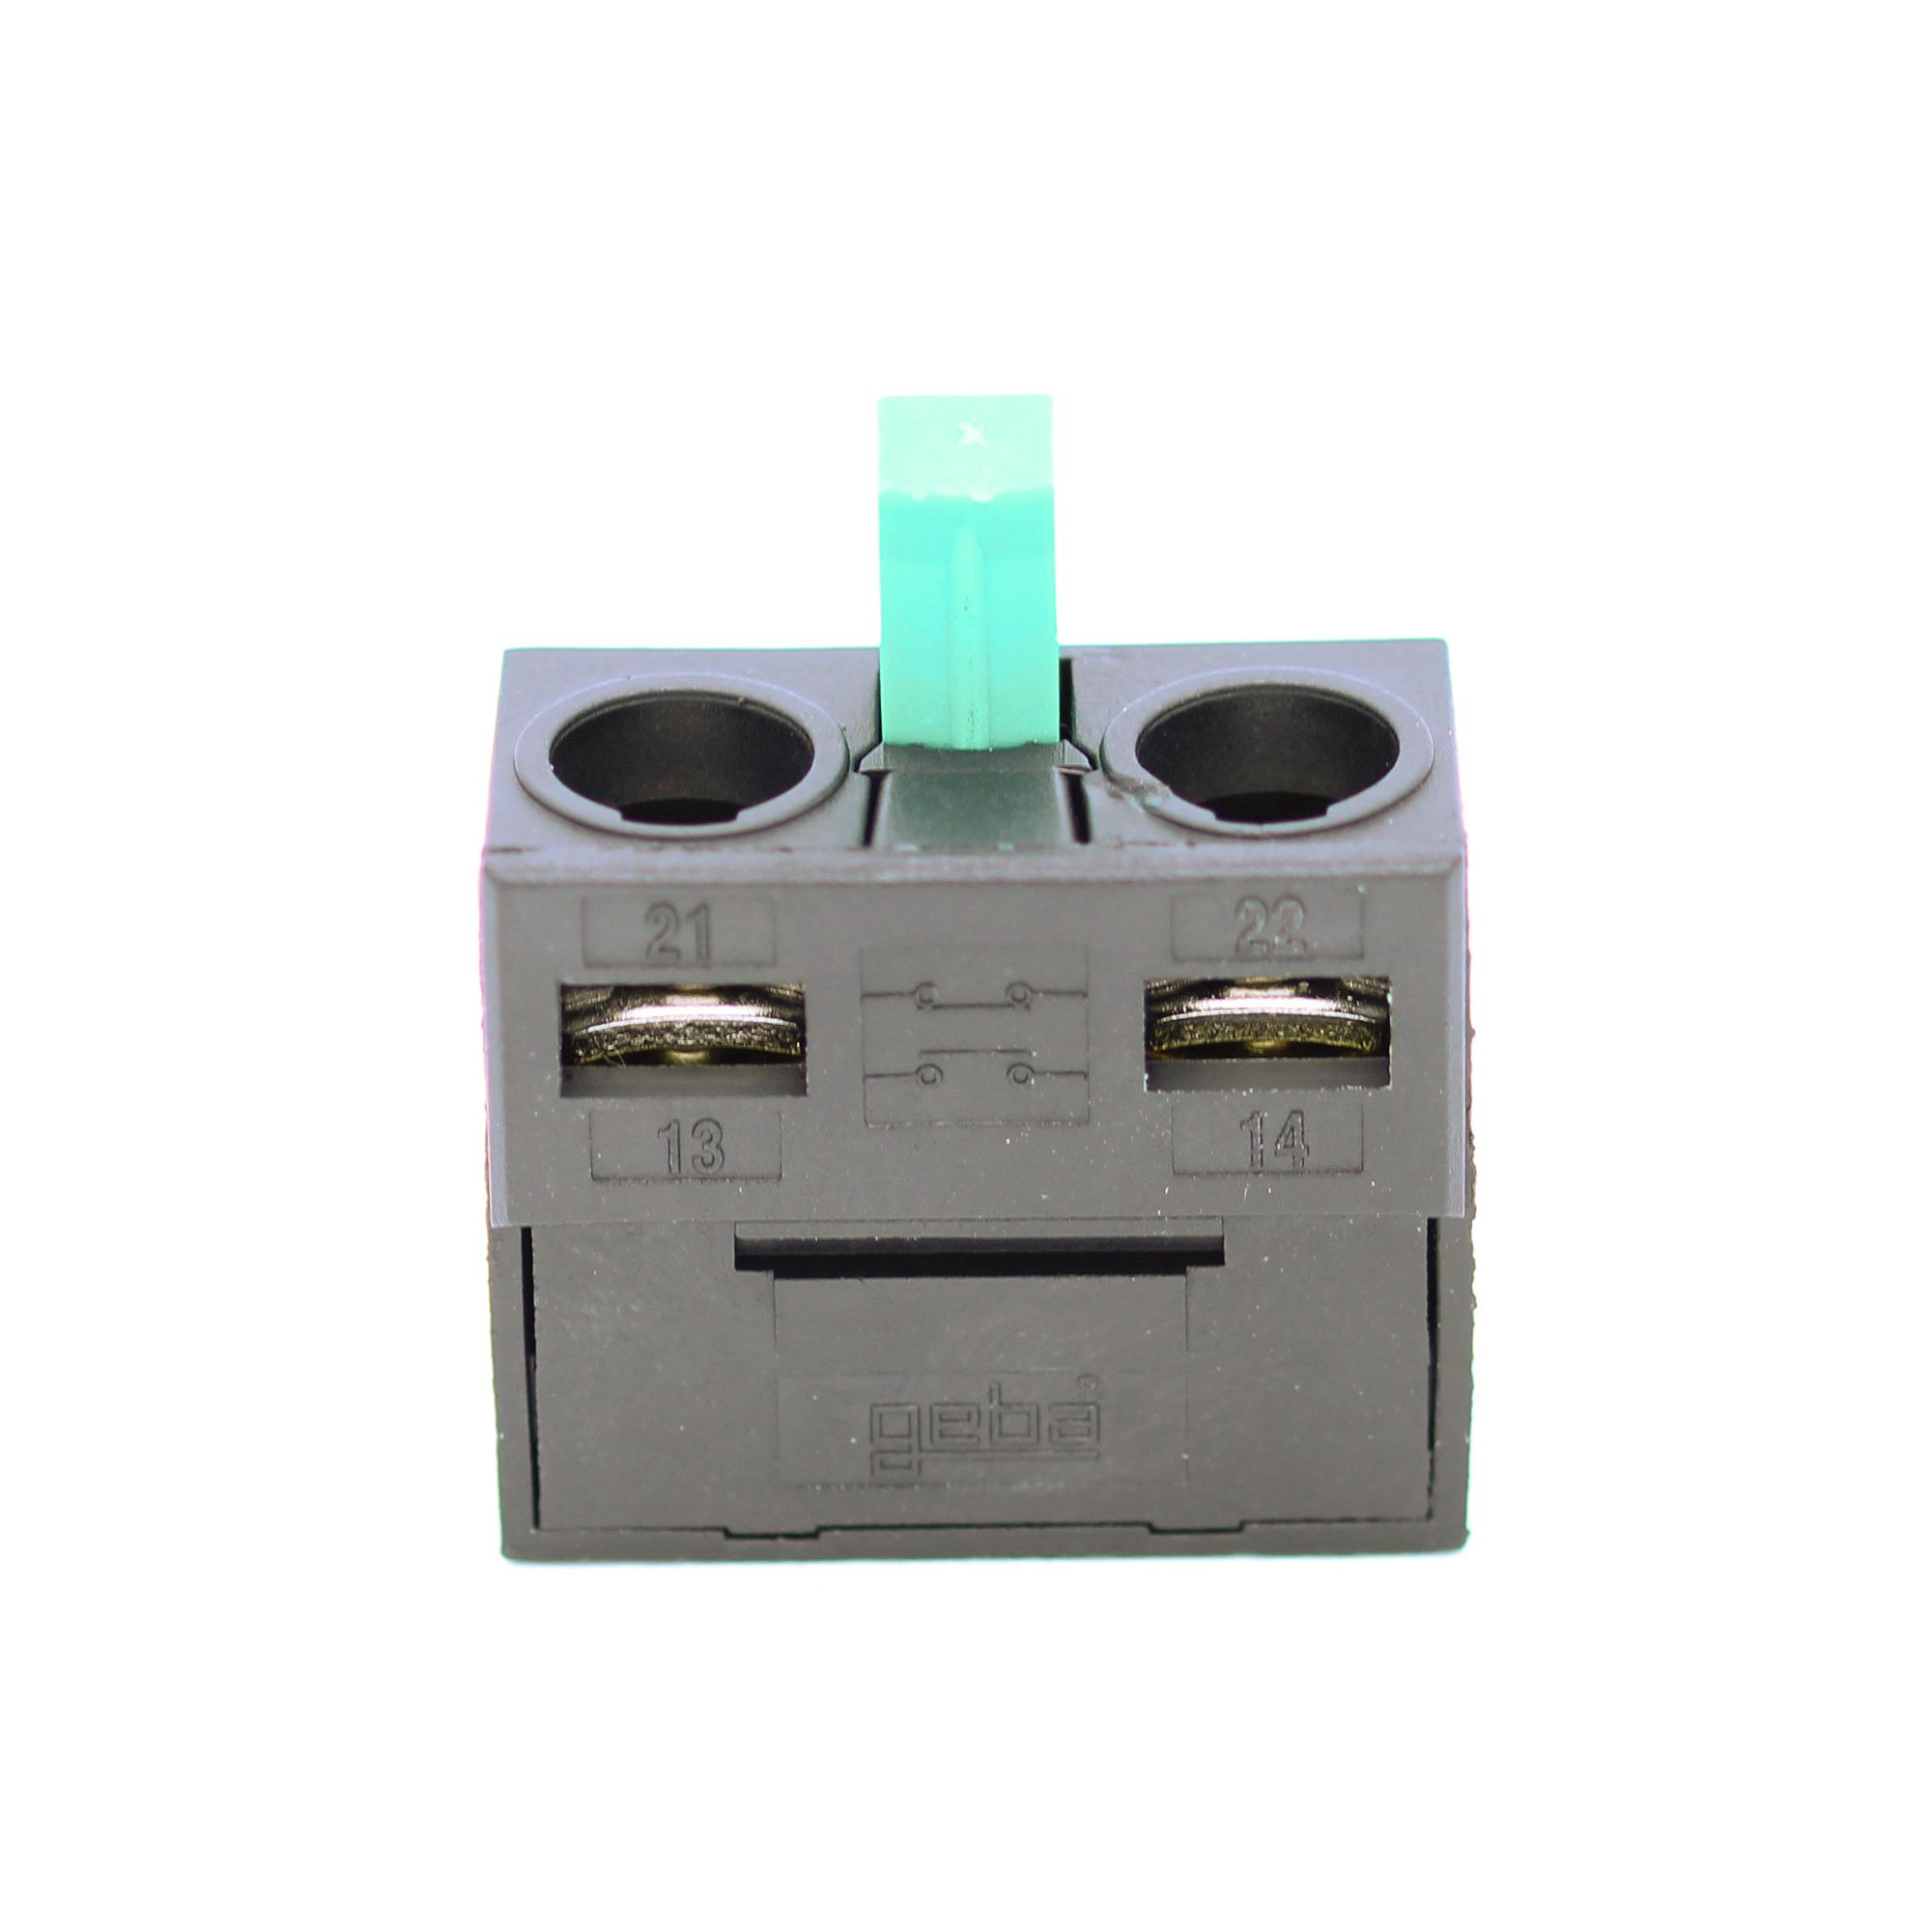 Hörmann Mikrotaster MKT 1 (Zubehör)